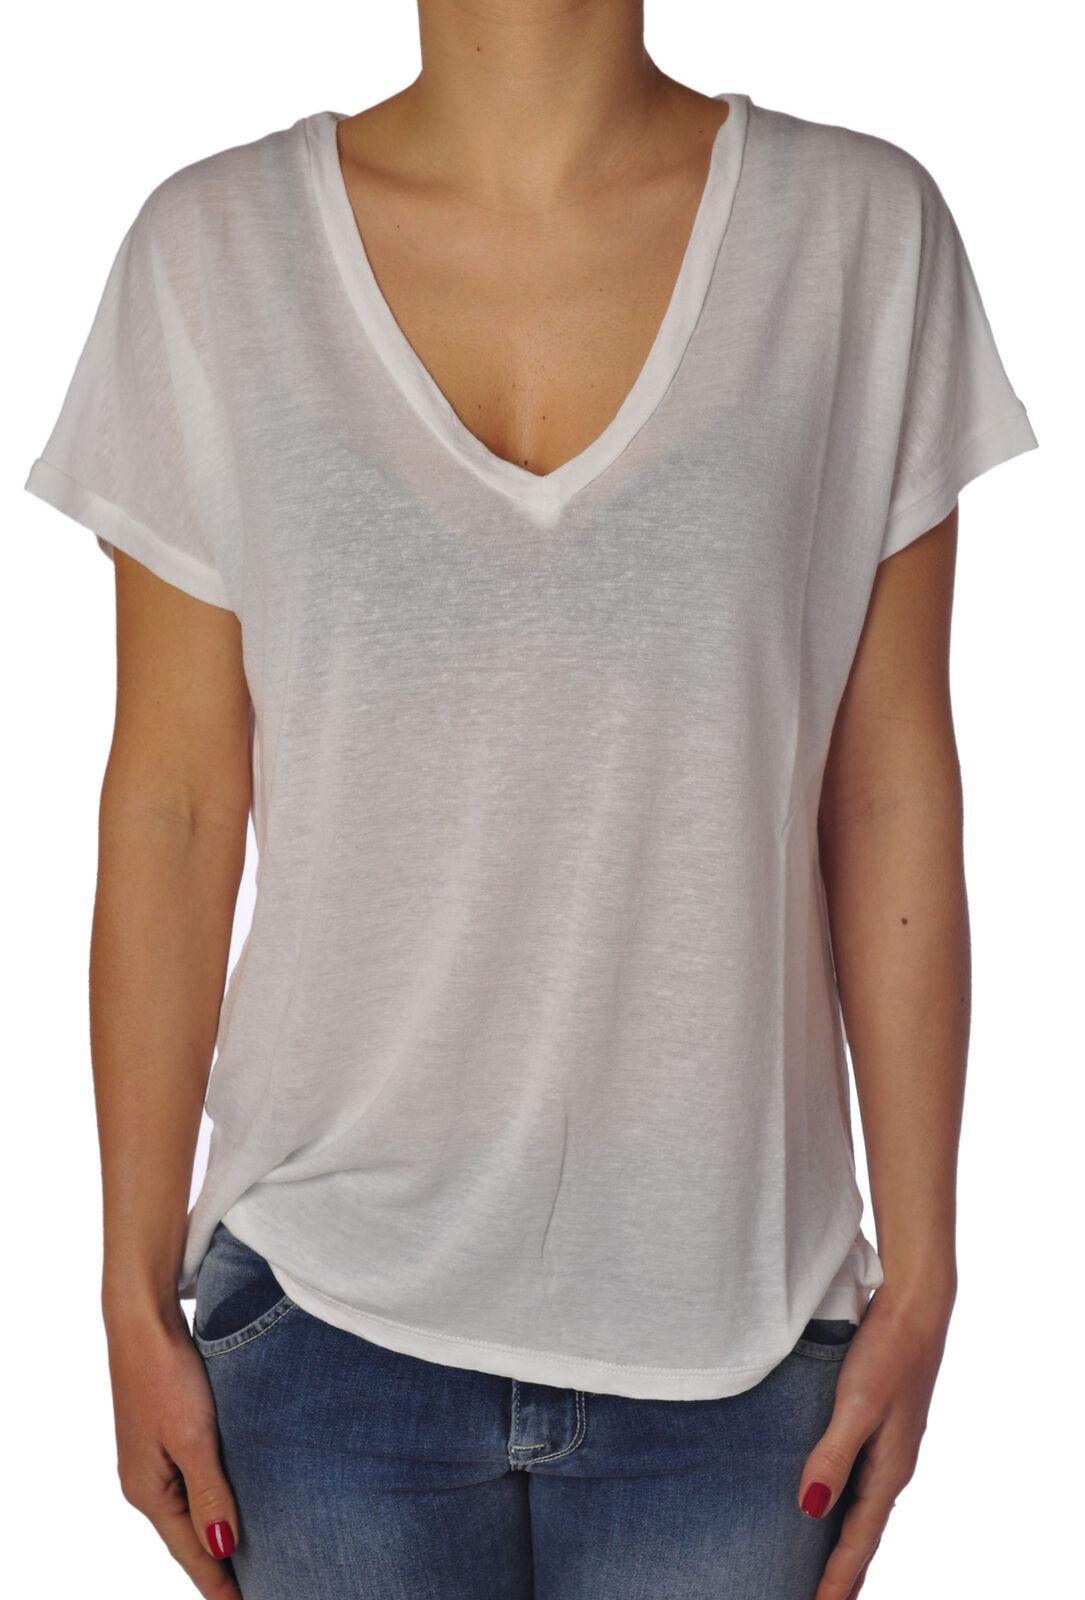 Soallure - Topwear-T-shirts - woman - 774317C184326